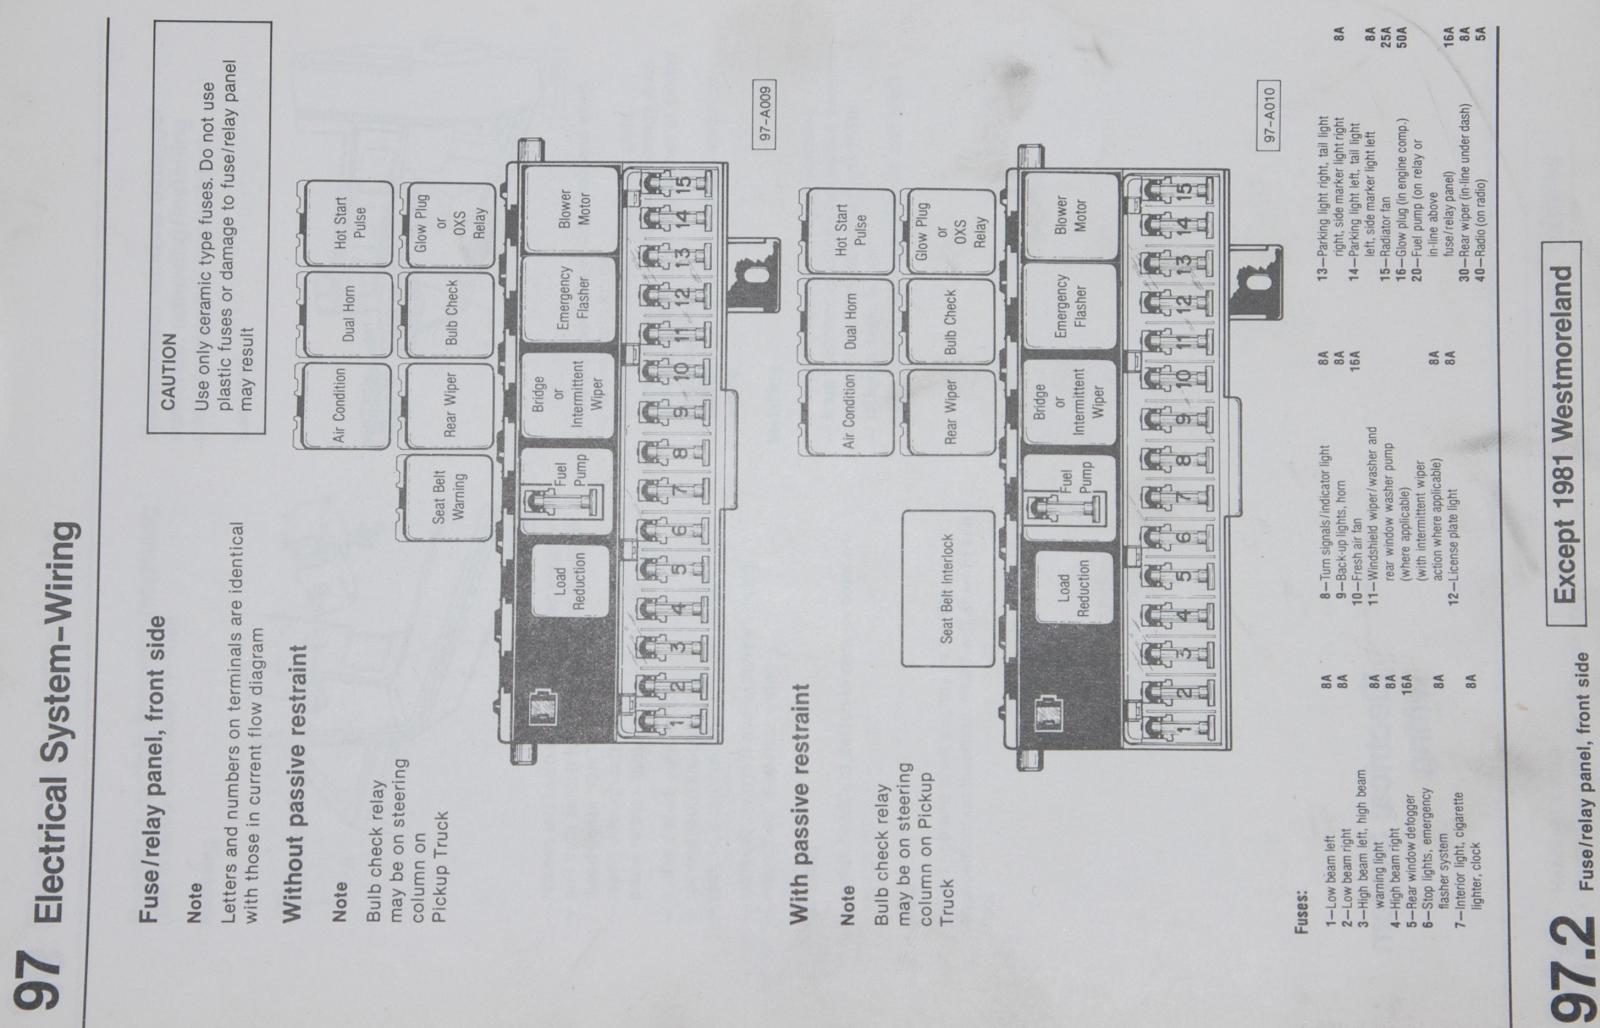 tags: #volkswagen jetta fuse box#2012 jetta interior fuse box#vw jetta fuse  box diagram#jetta fuse box diagram#2011 jetta fuse box diagram#2005 vw jetta